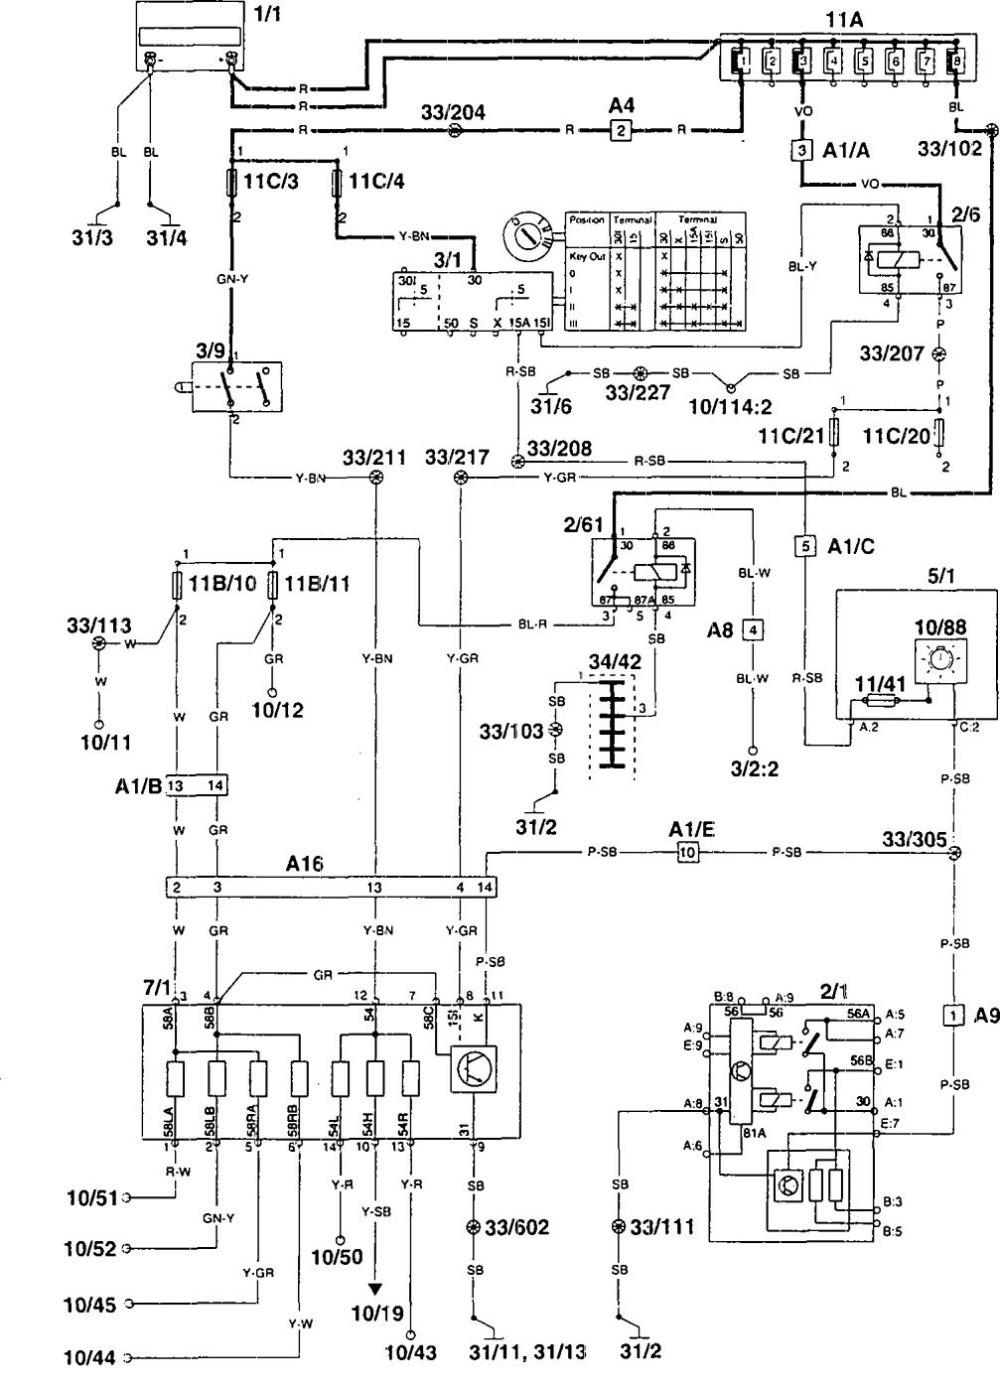 medium resolution of volvo 960 wiring diagram wiring library 1997 volvo 960 wiring diagrams 1995 volvo 960 wiring diagram